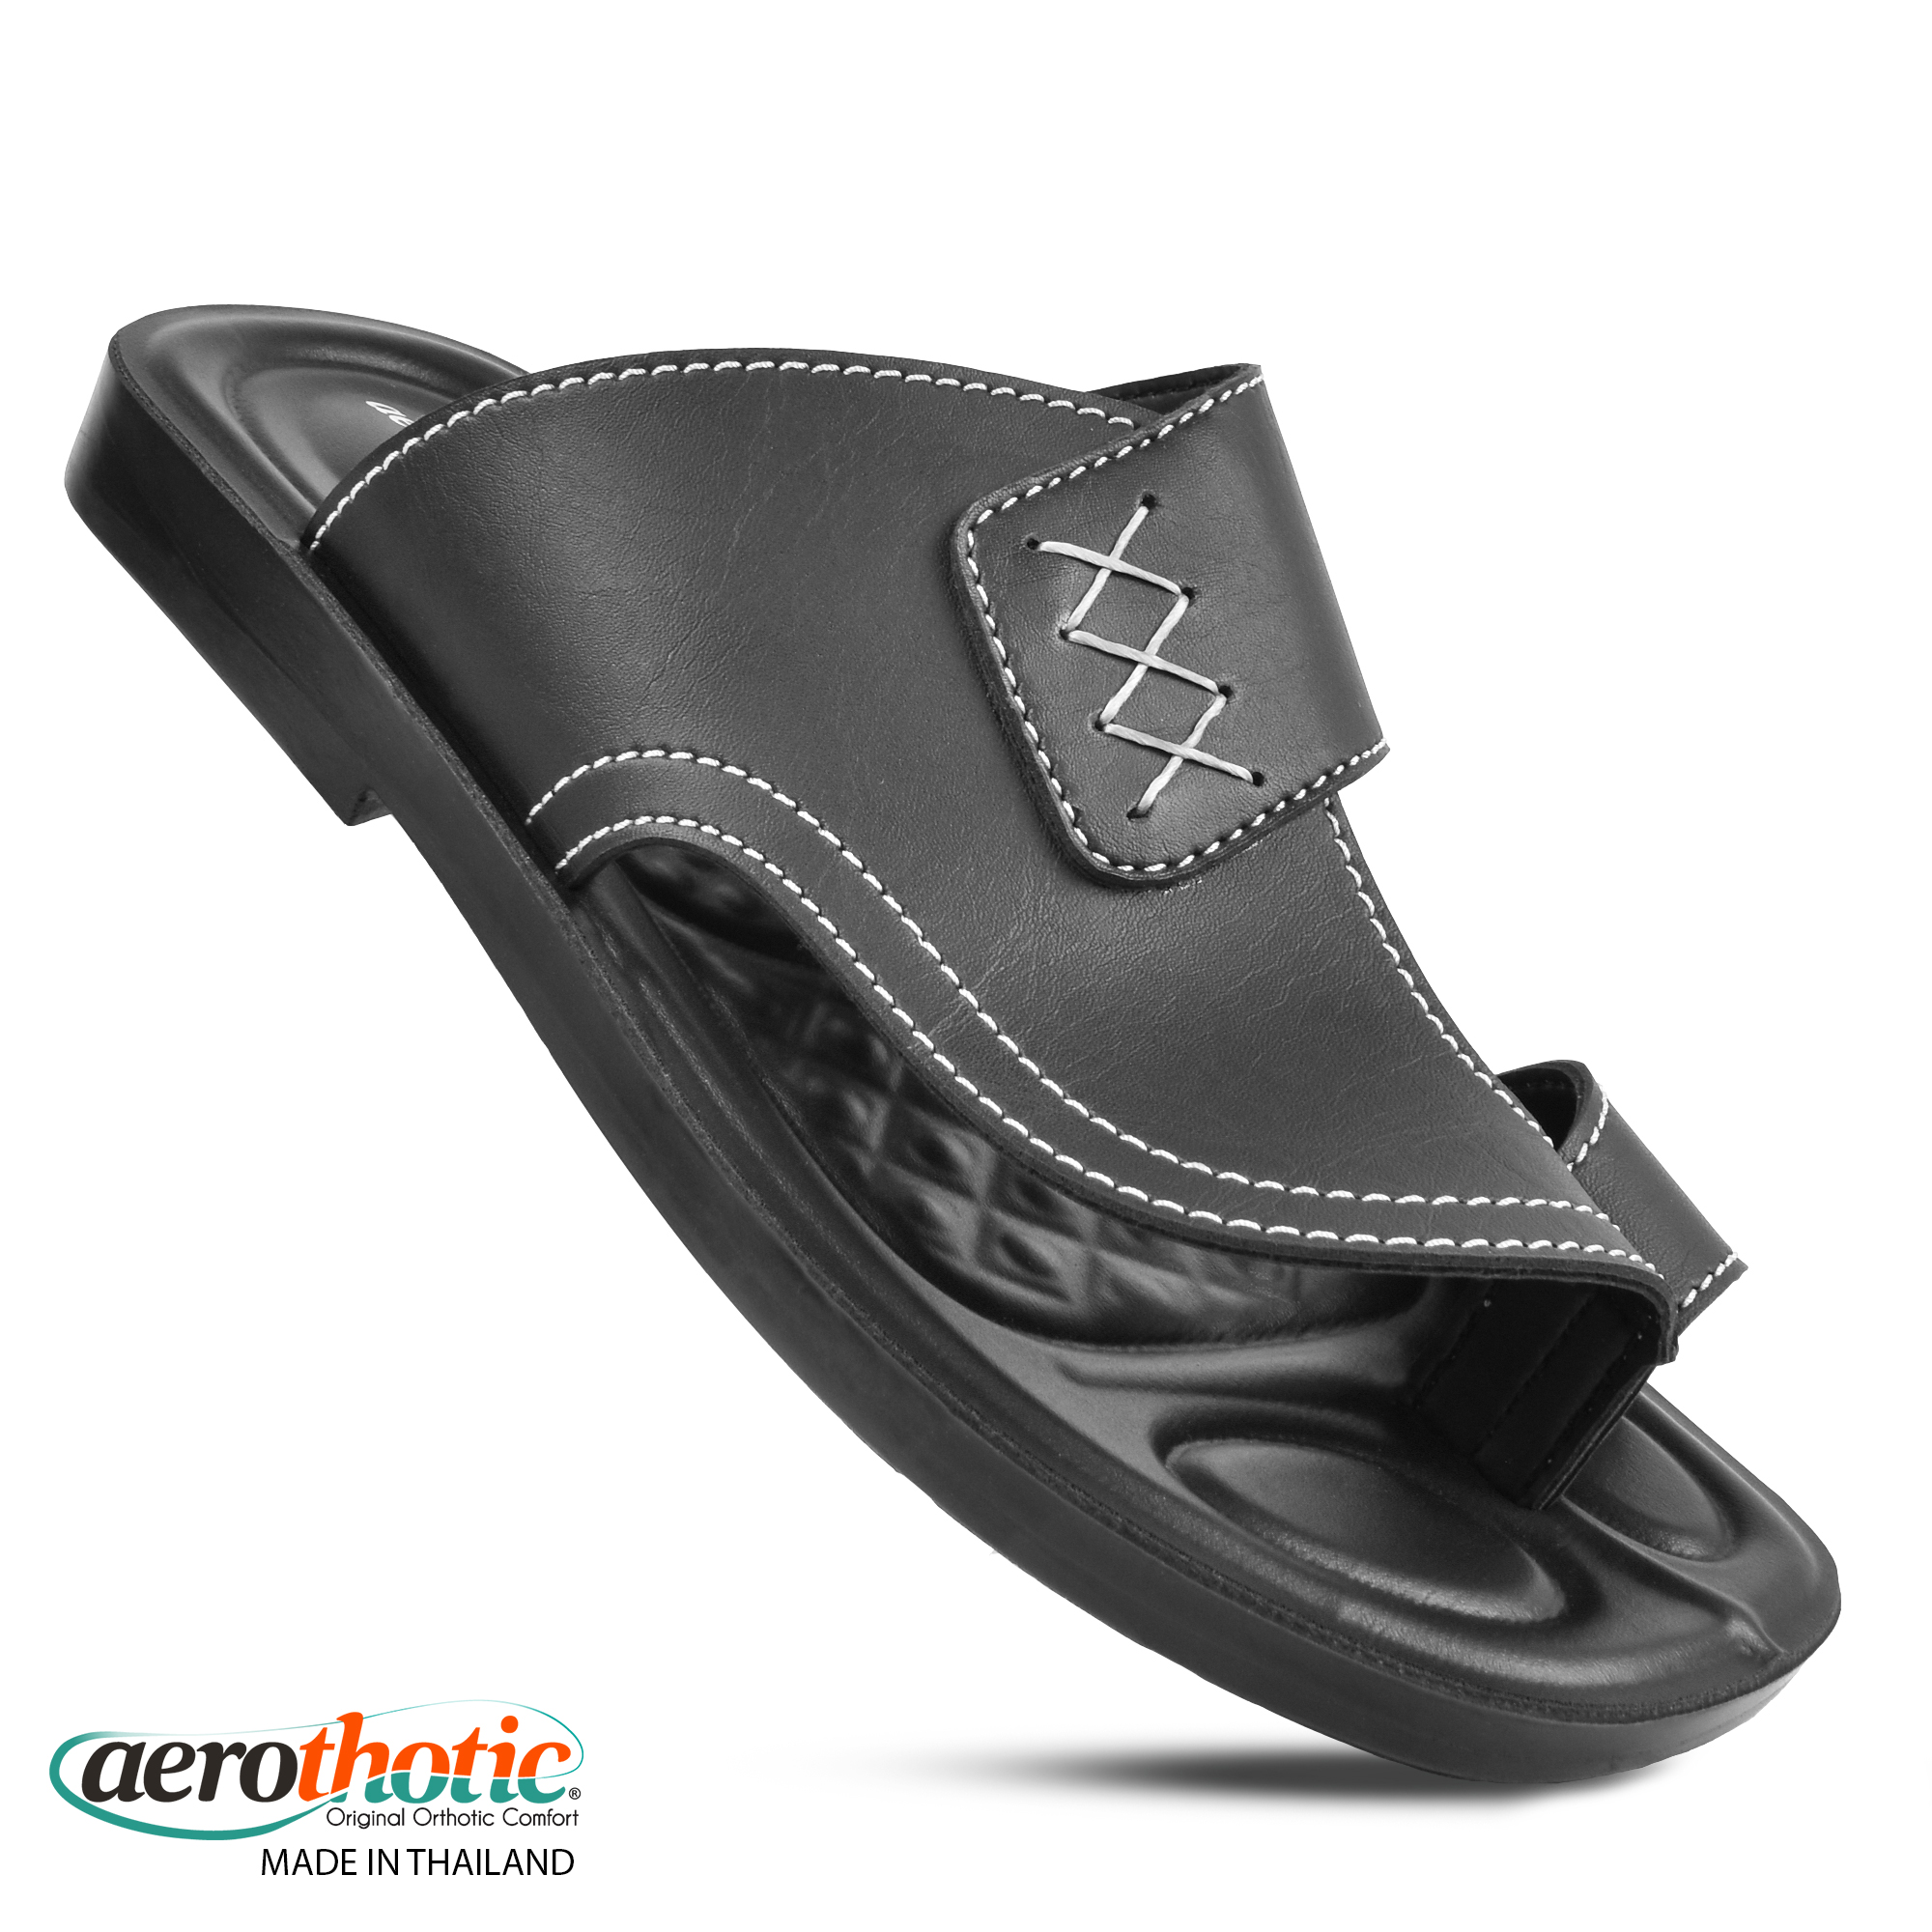 AEROTHOTIC Men's Comfortable Chappal - Original Thailand Imported - M0803